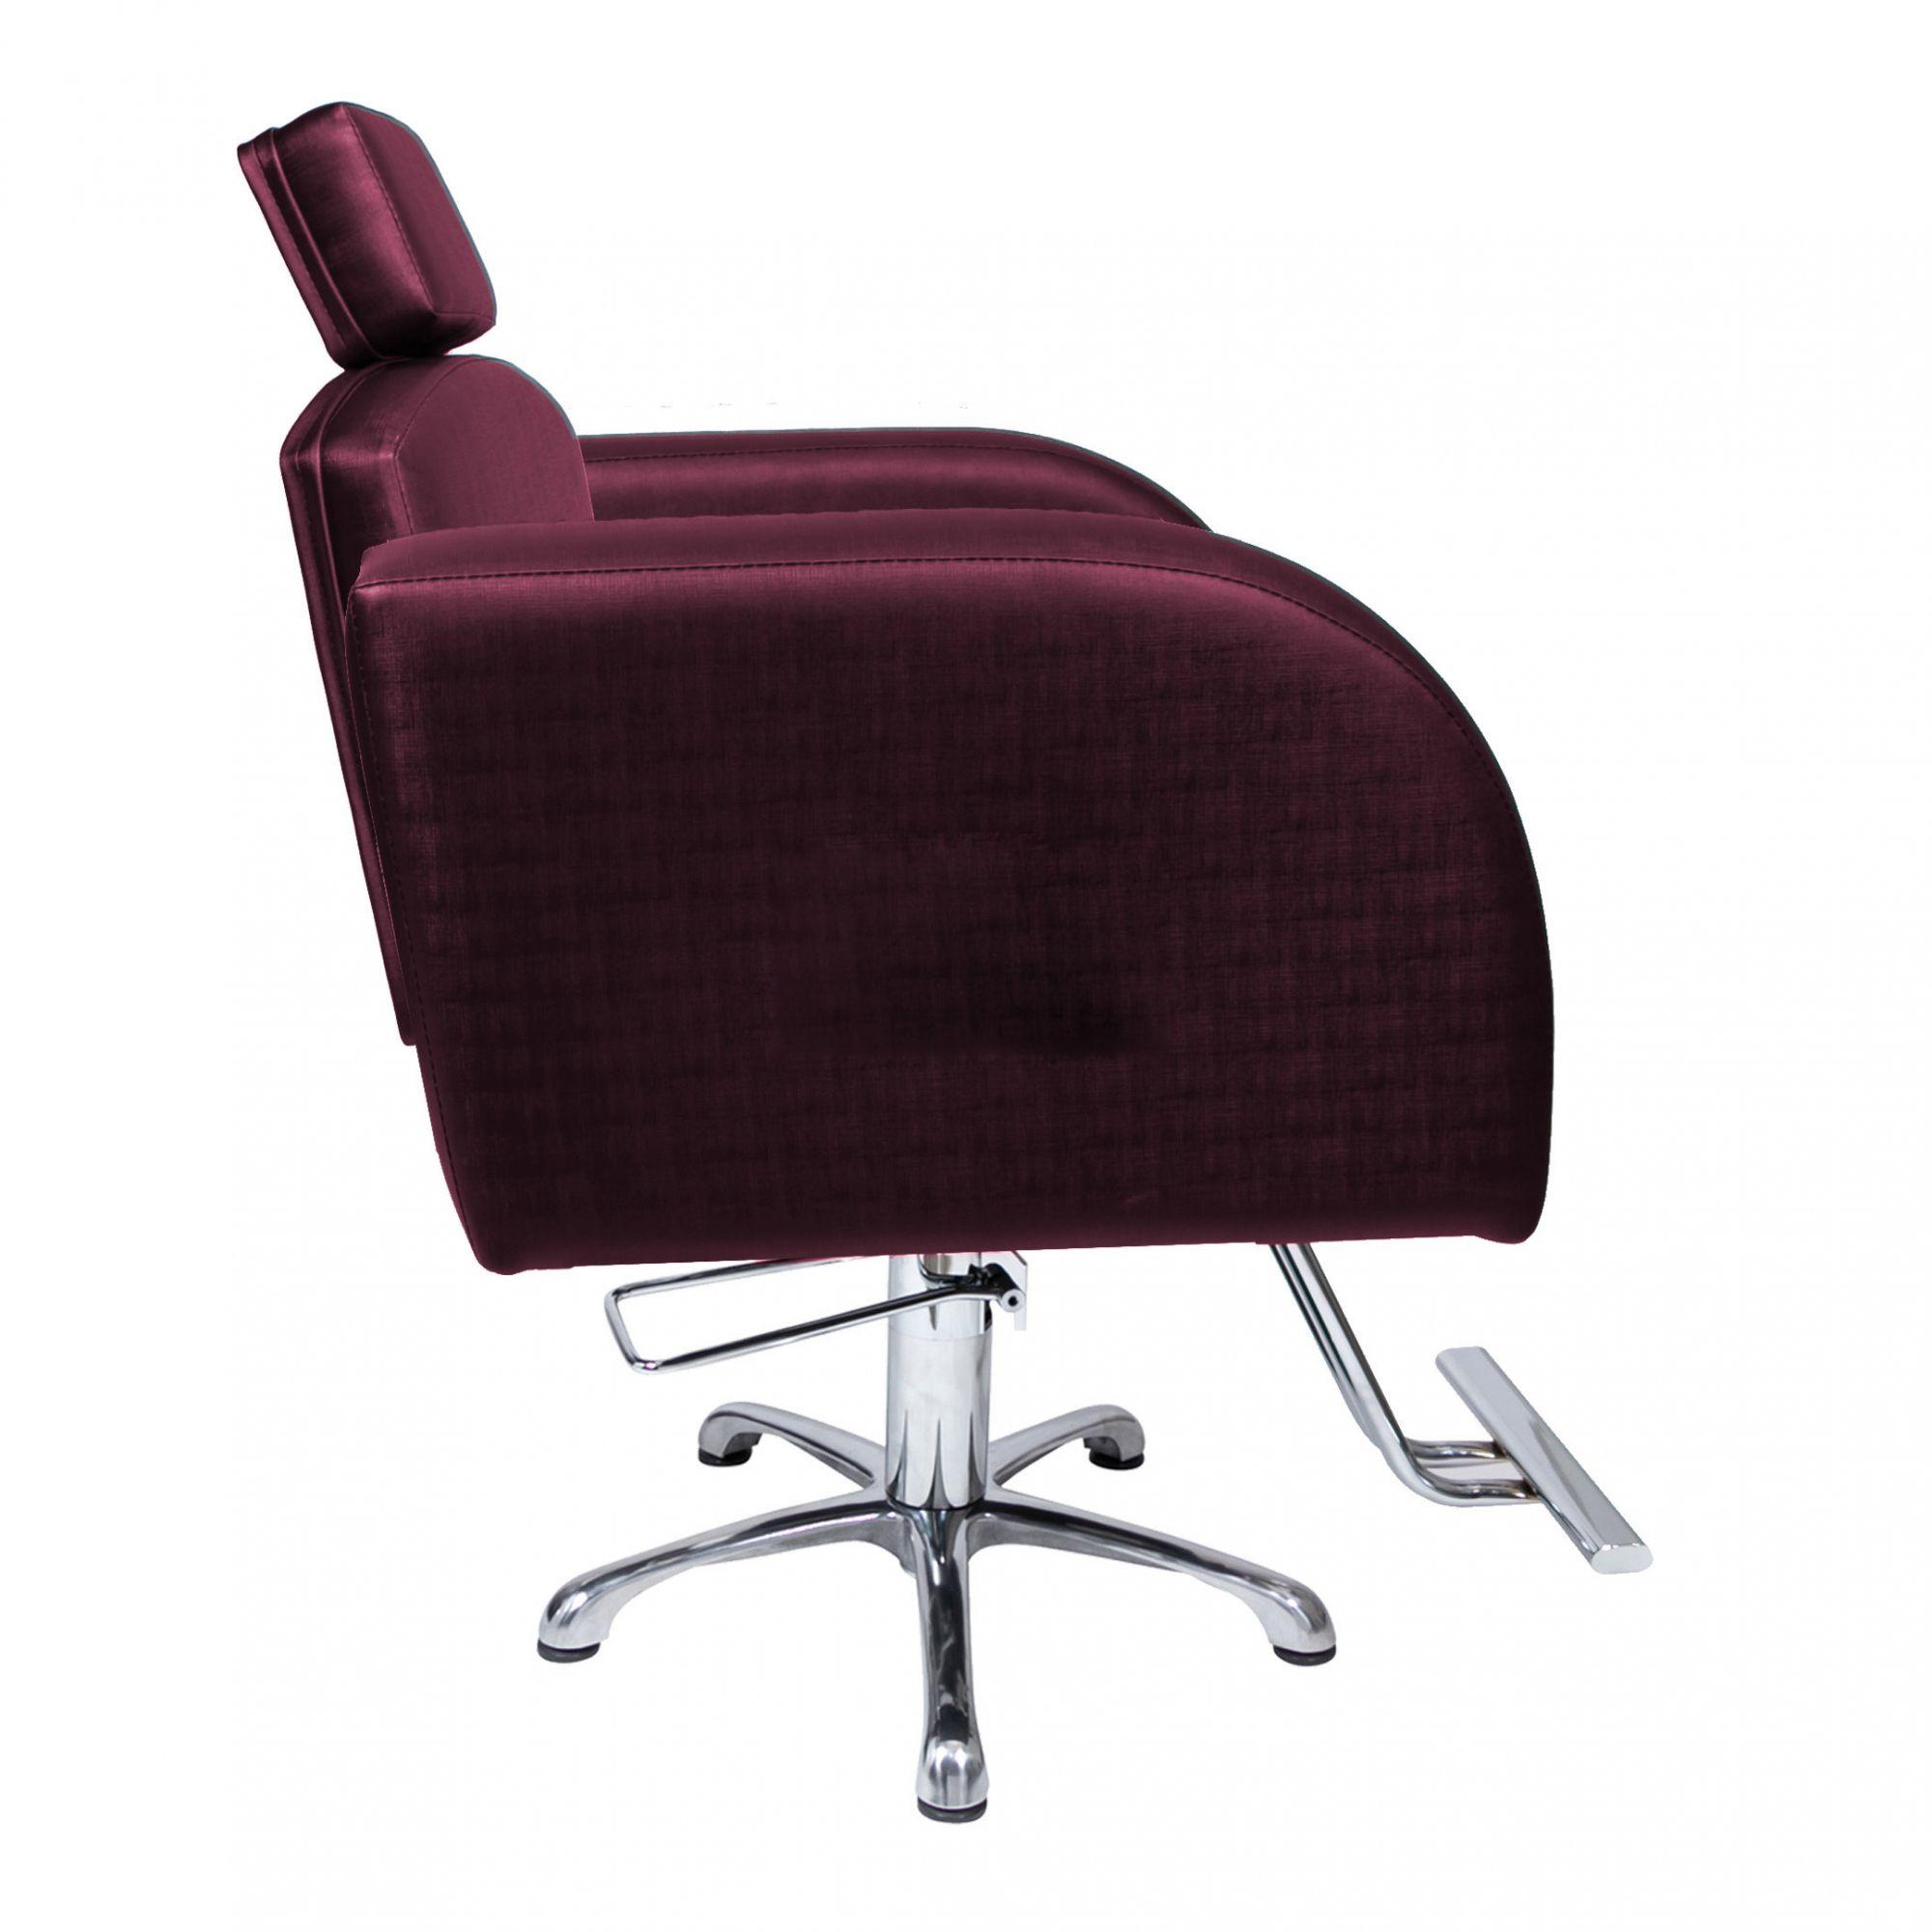 Poltrona Cadeira Hidráulica Destak Fixa Para Salão Bordo Factor